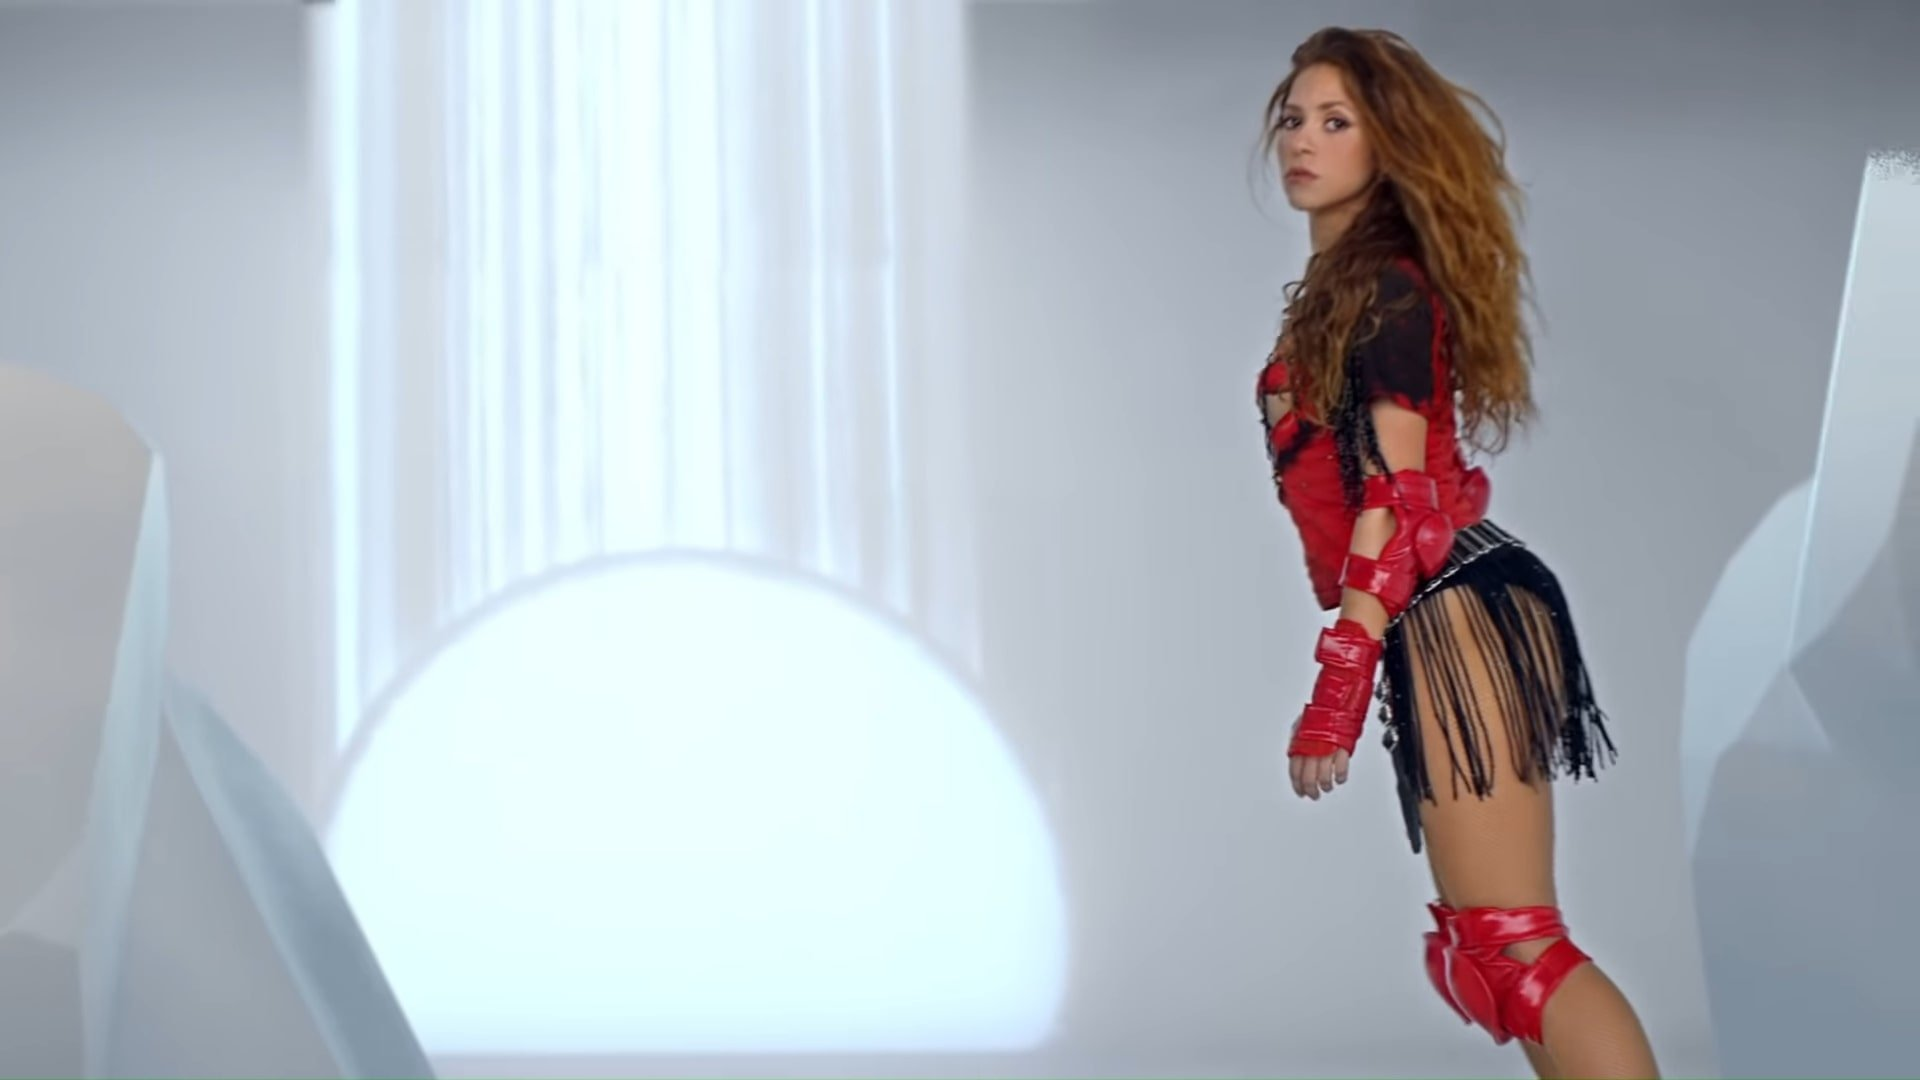 Black Eyed Peas, Shakira - GIRL LIKE ME (Official Music Video) 2-23 Screenshot